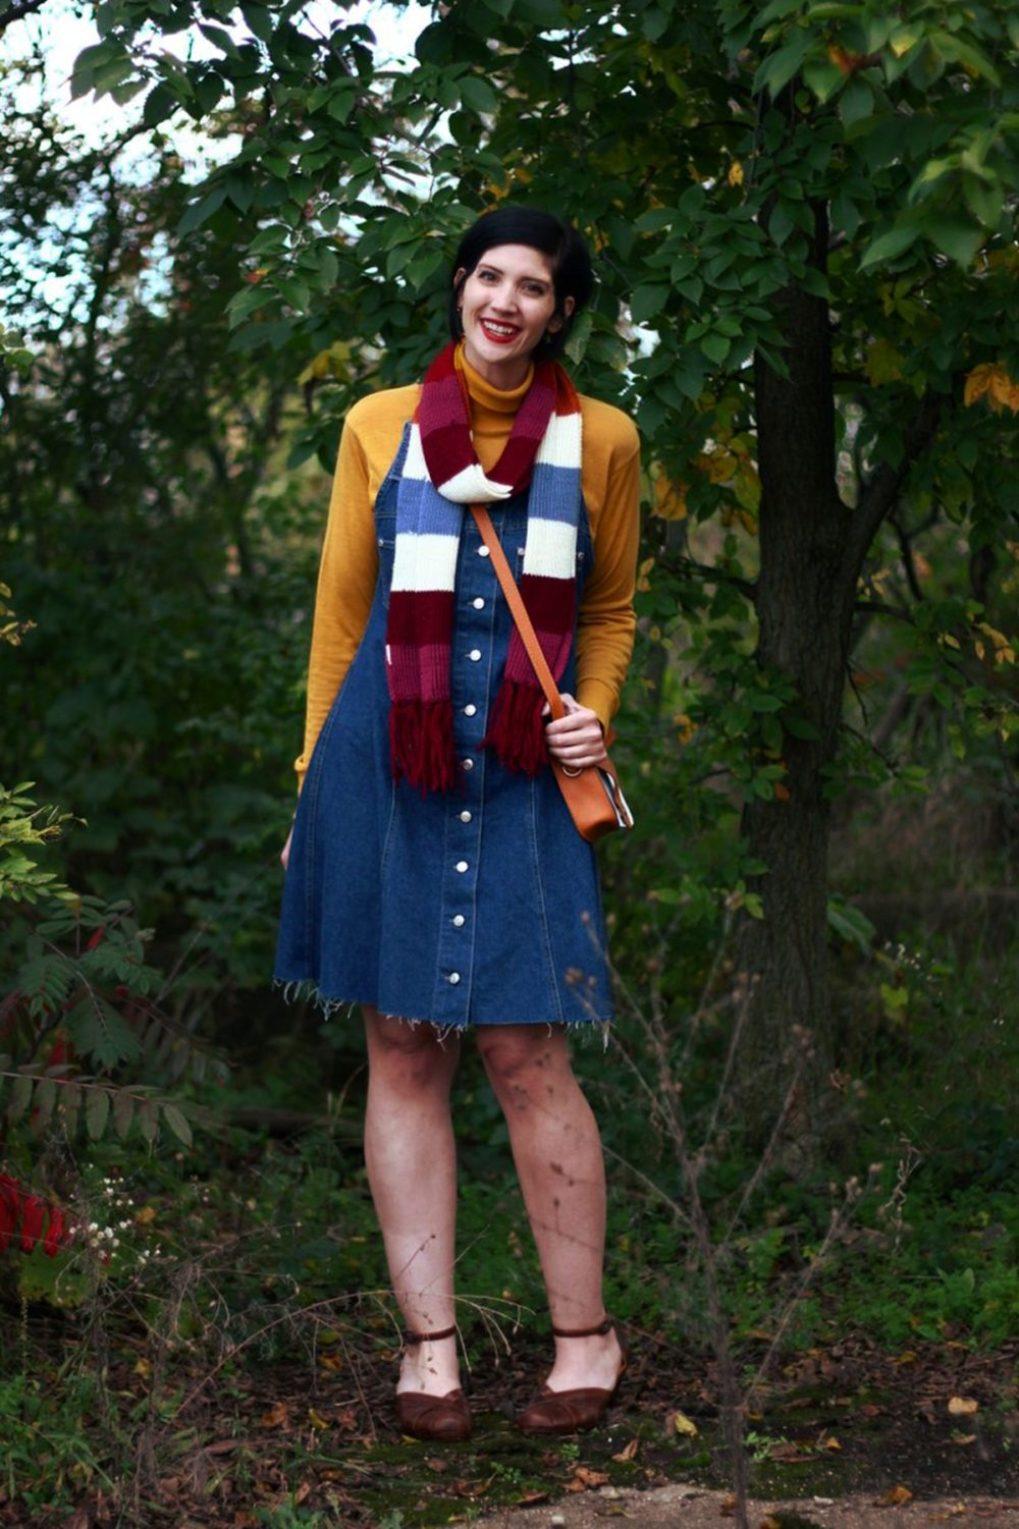 Outfit: Mustard yellow turtleneck, denim overall dress, multi-colored striped scarf, red lipstick, orange fox handbag, brown platforms